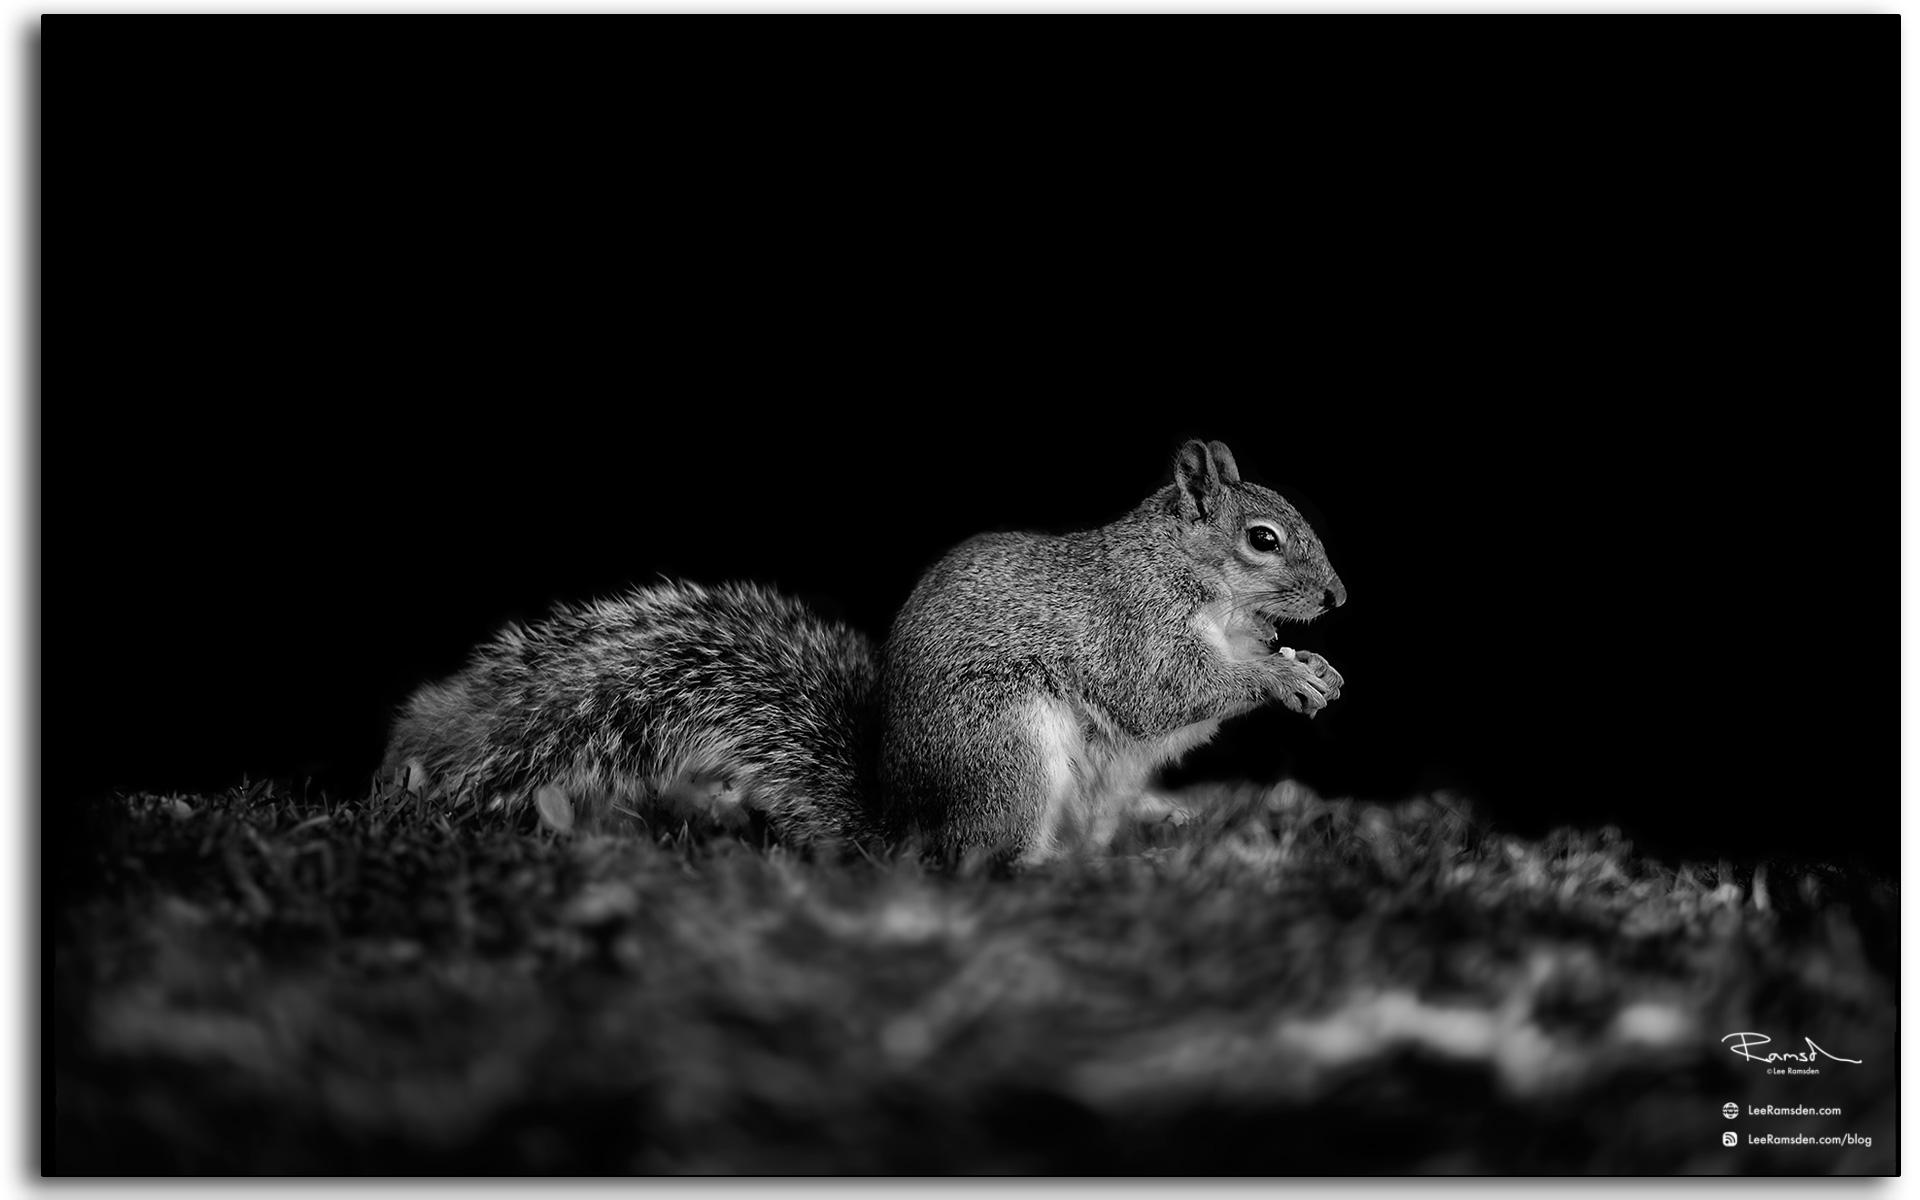 grey squirrel uk eating nuts